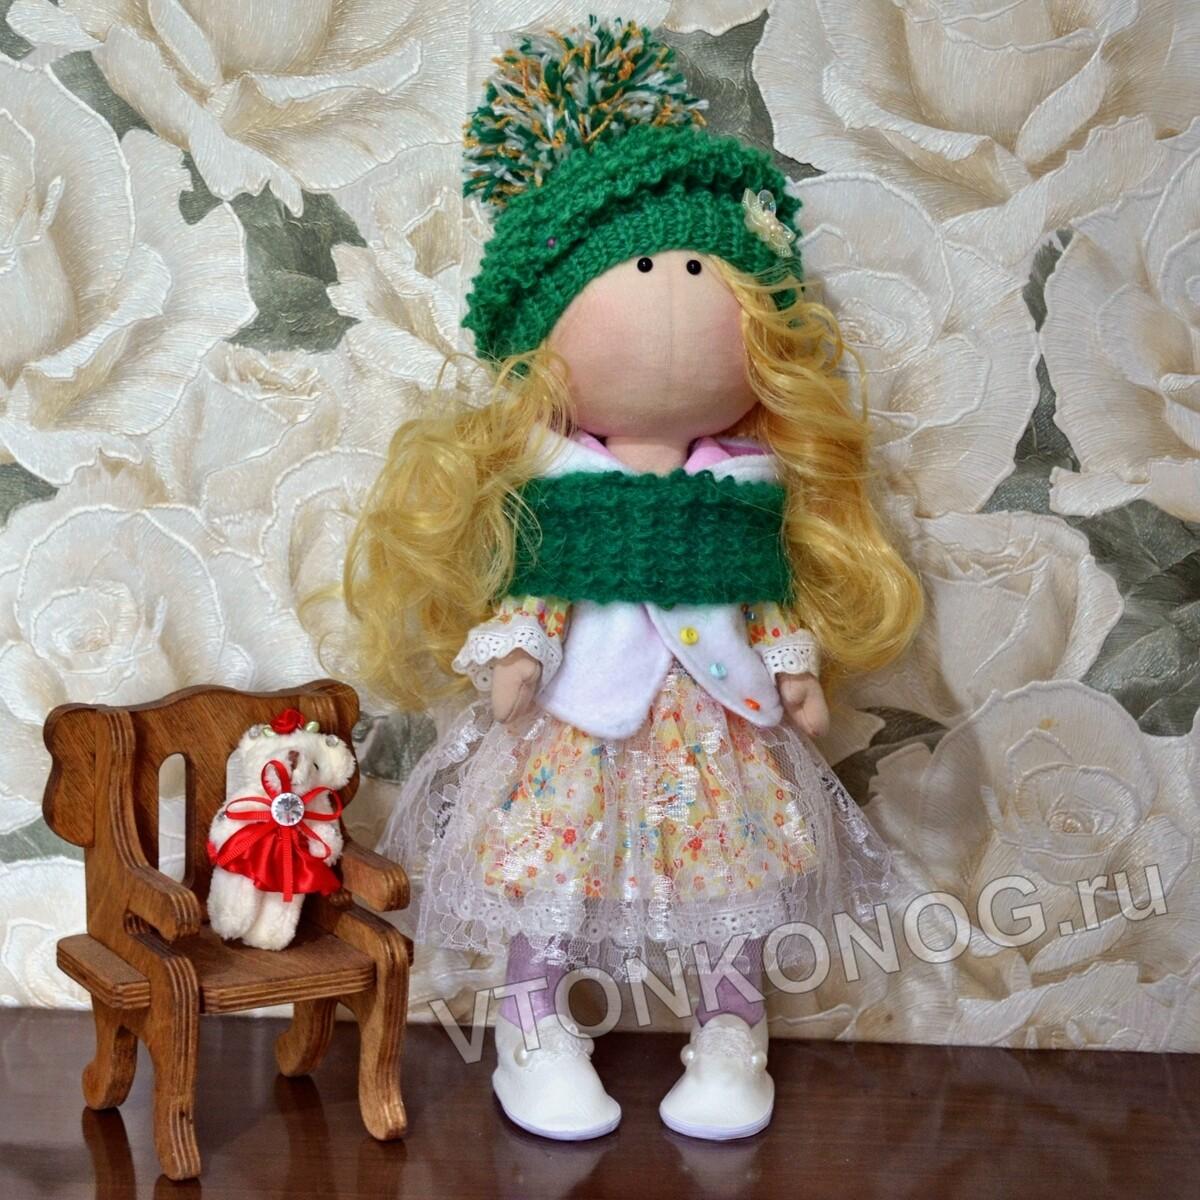 Текстильная кукла Таисия